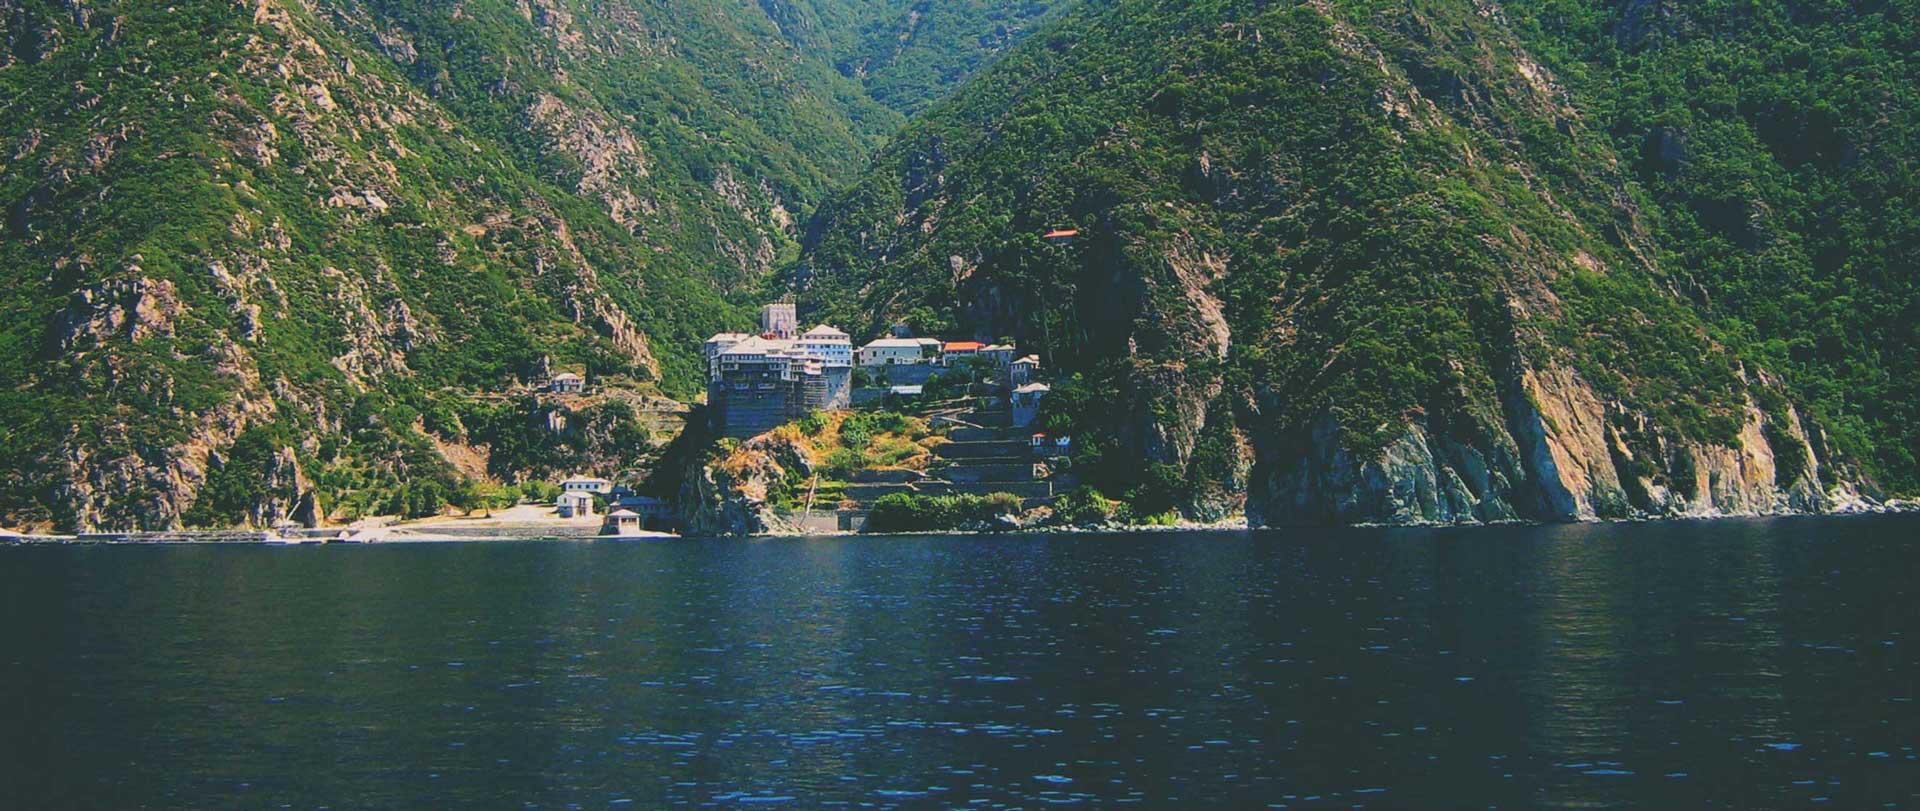 Filos Travel: Your friend for Shuttle transfers in Greece!